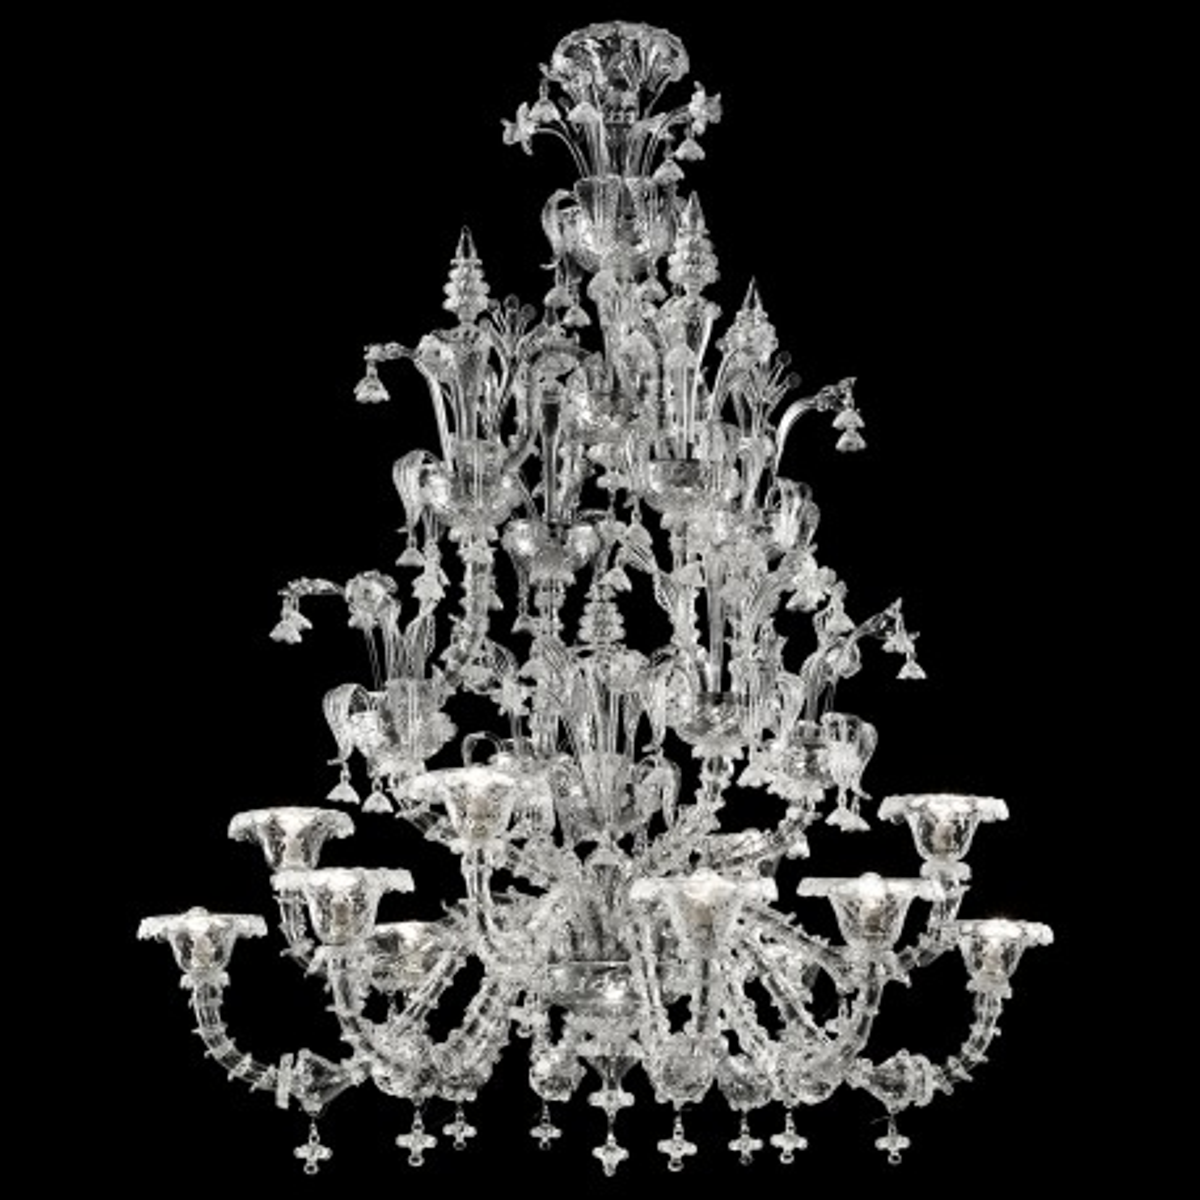 """Ginevra"" lampara de araña de Murano - 8+4 luces - transparente"